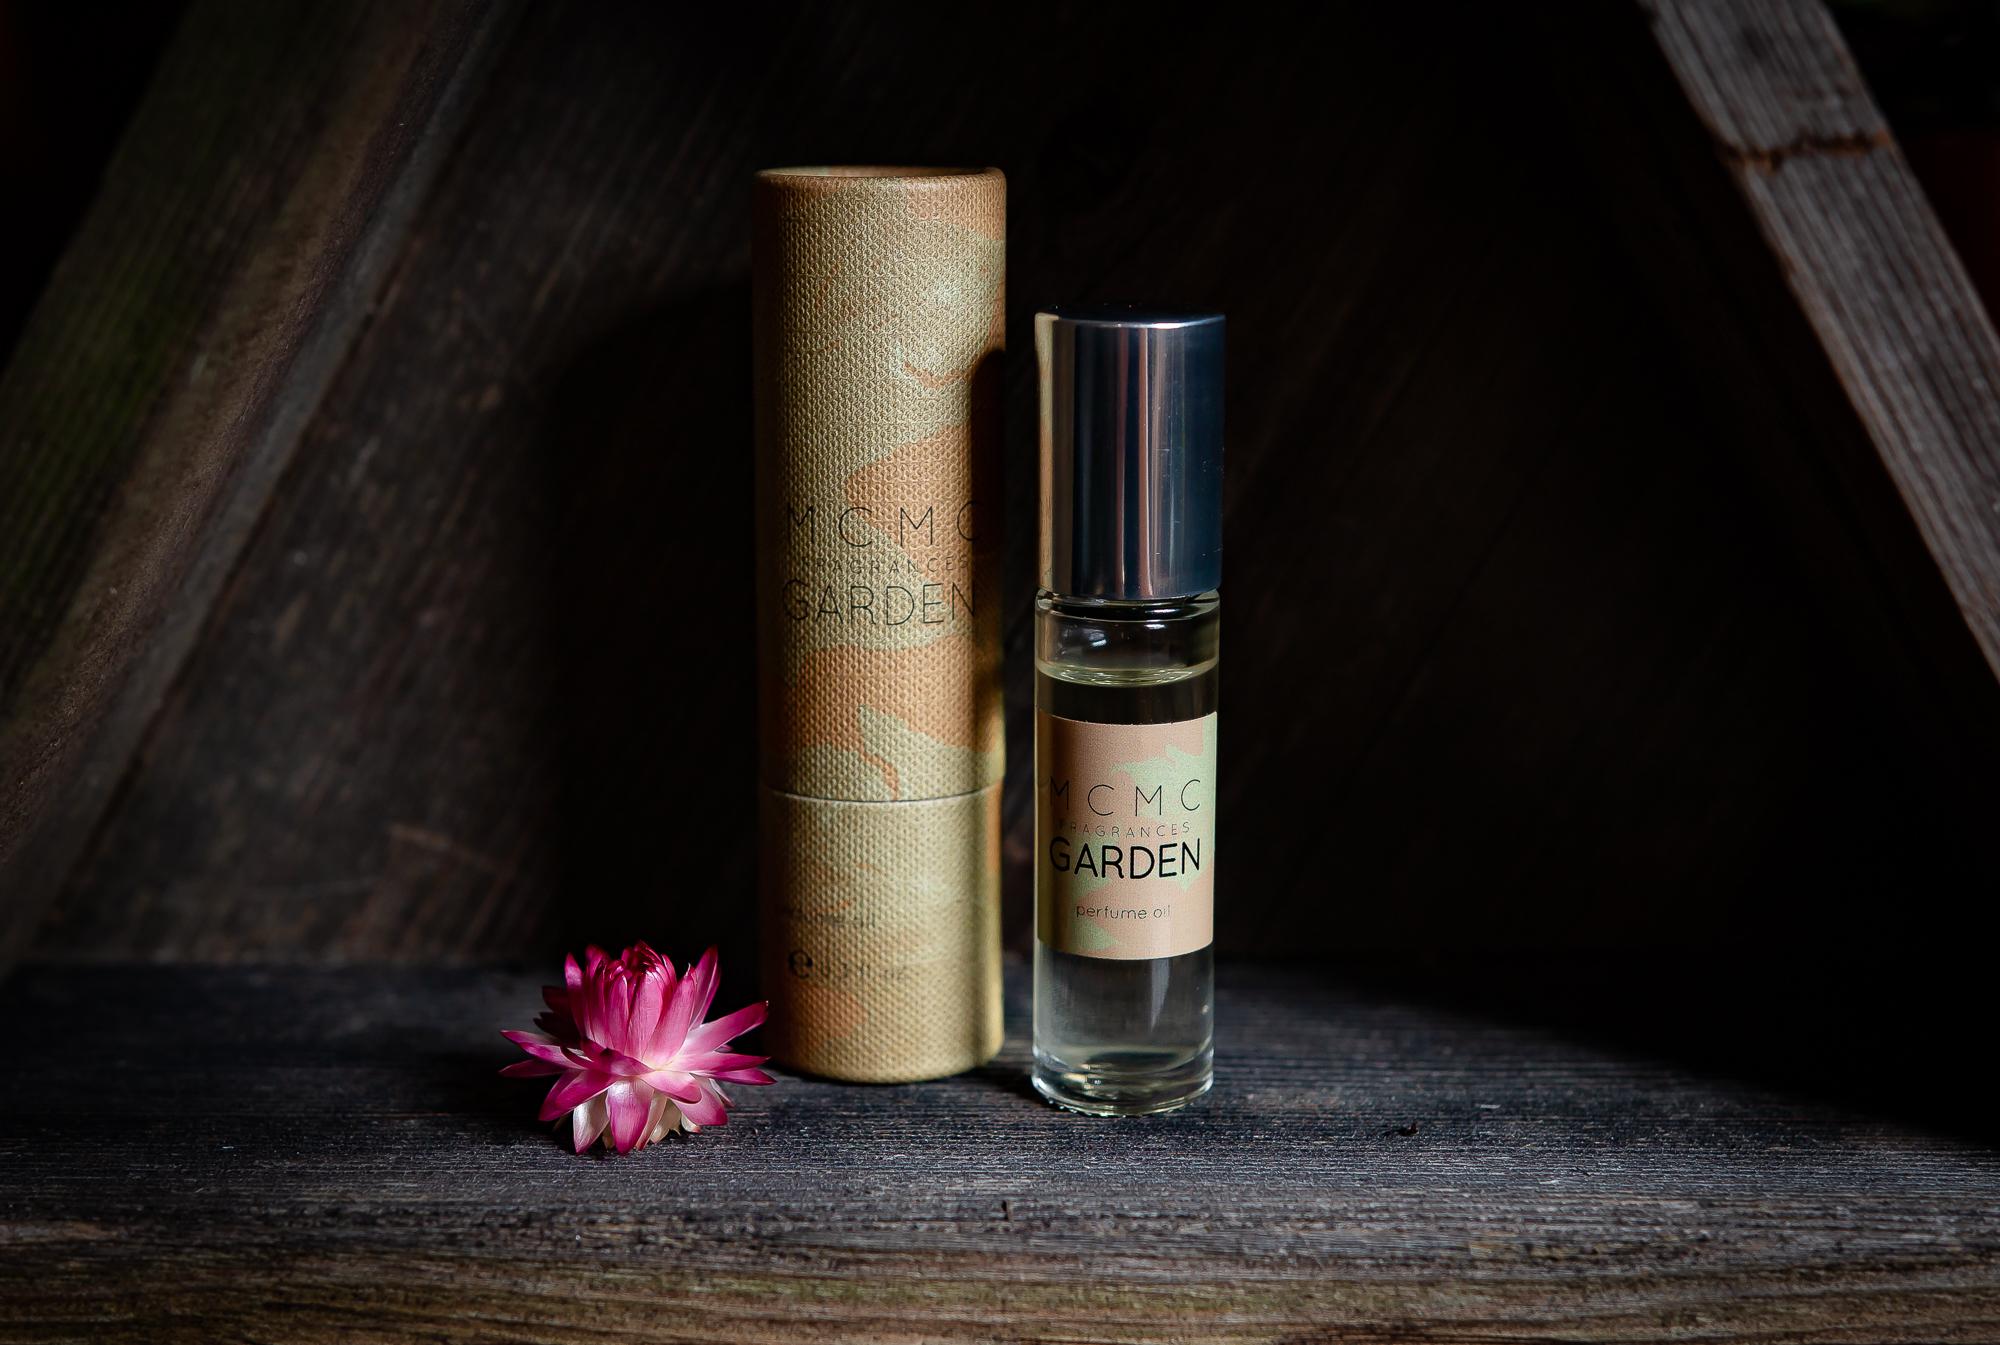 mcmc-garden-perfume.jpeg